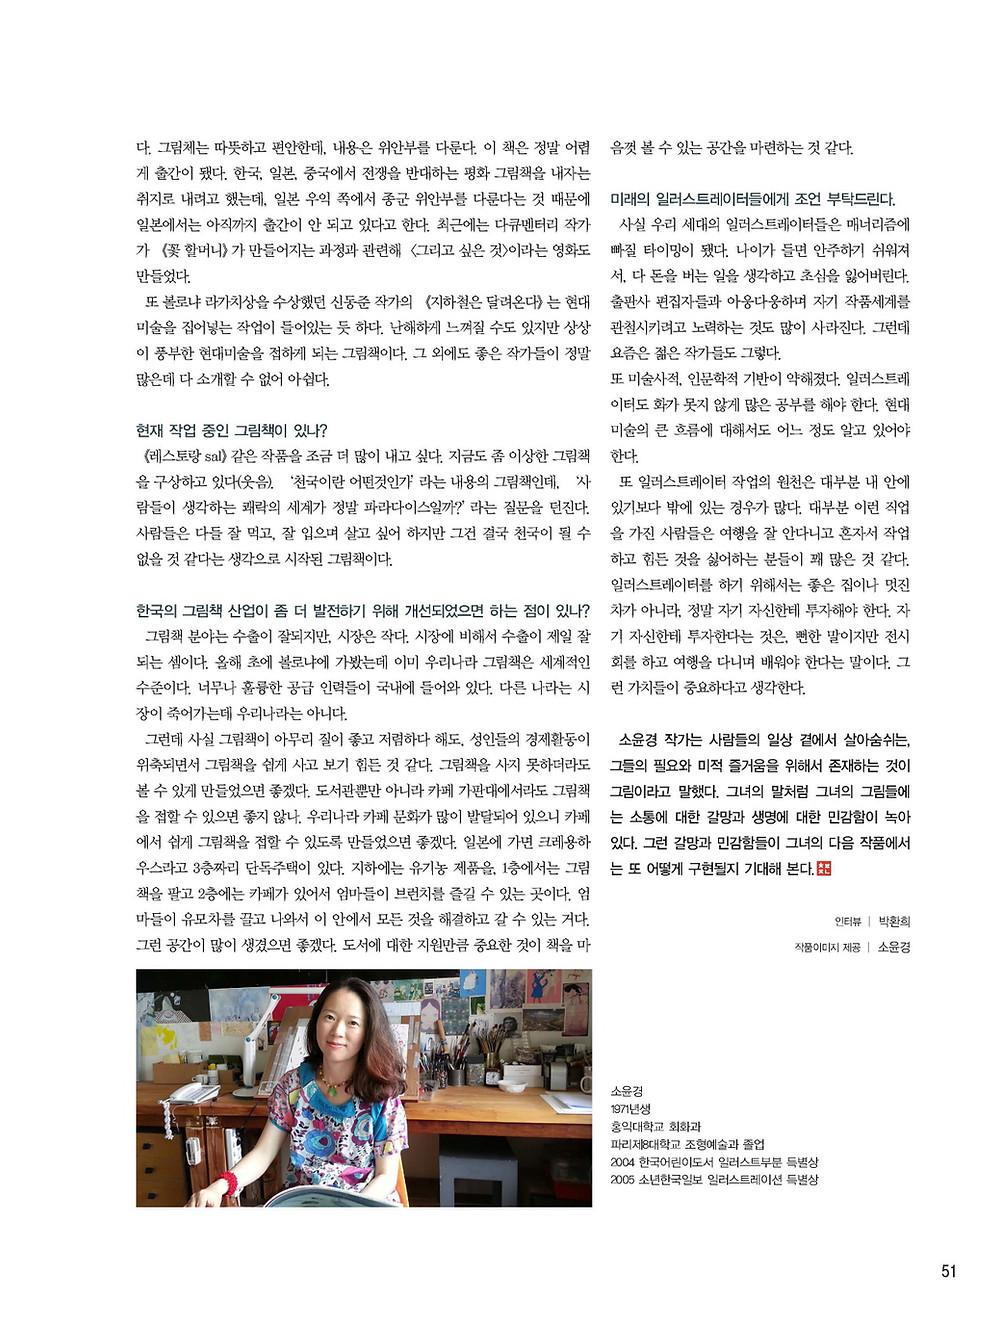 s_한국의 그림책 작가를 만나다 (6).jpg